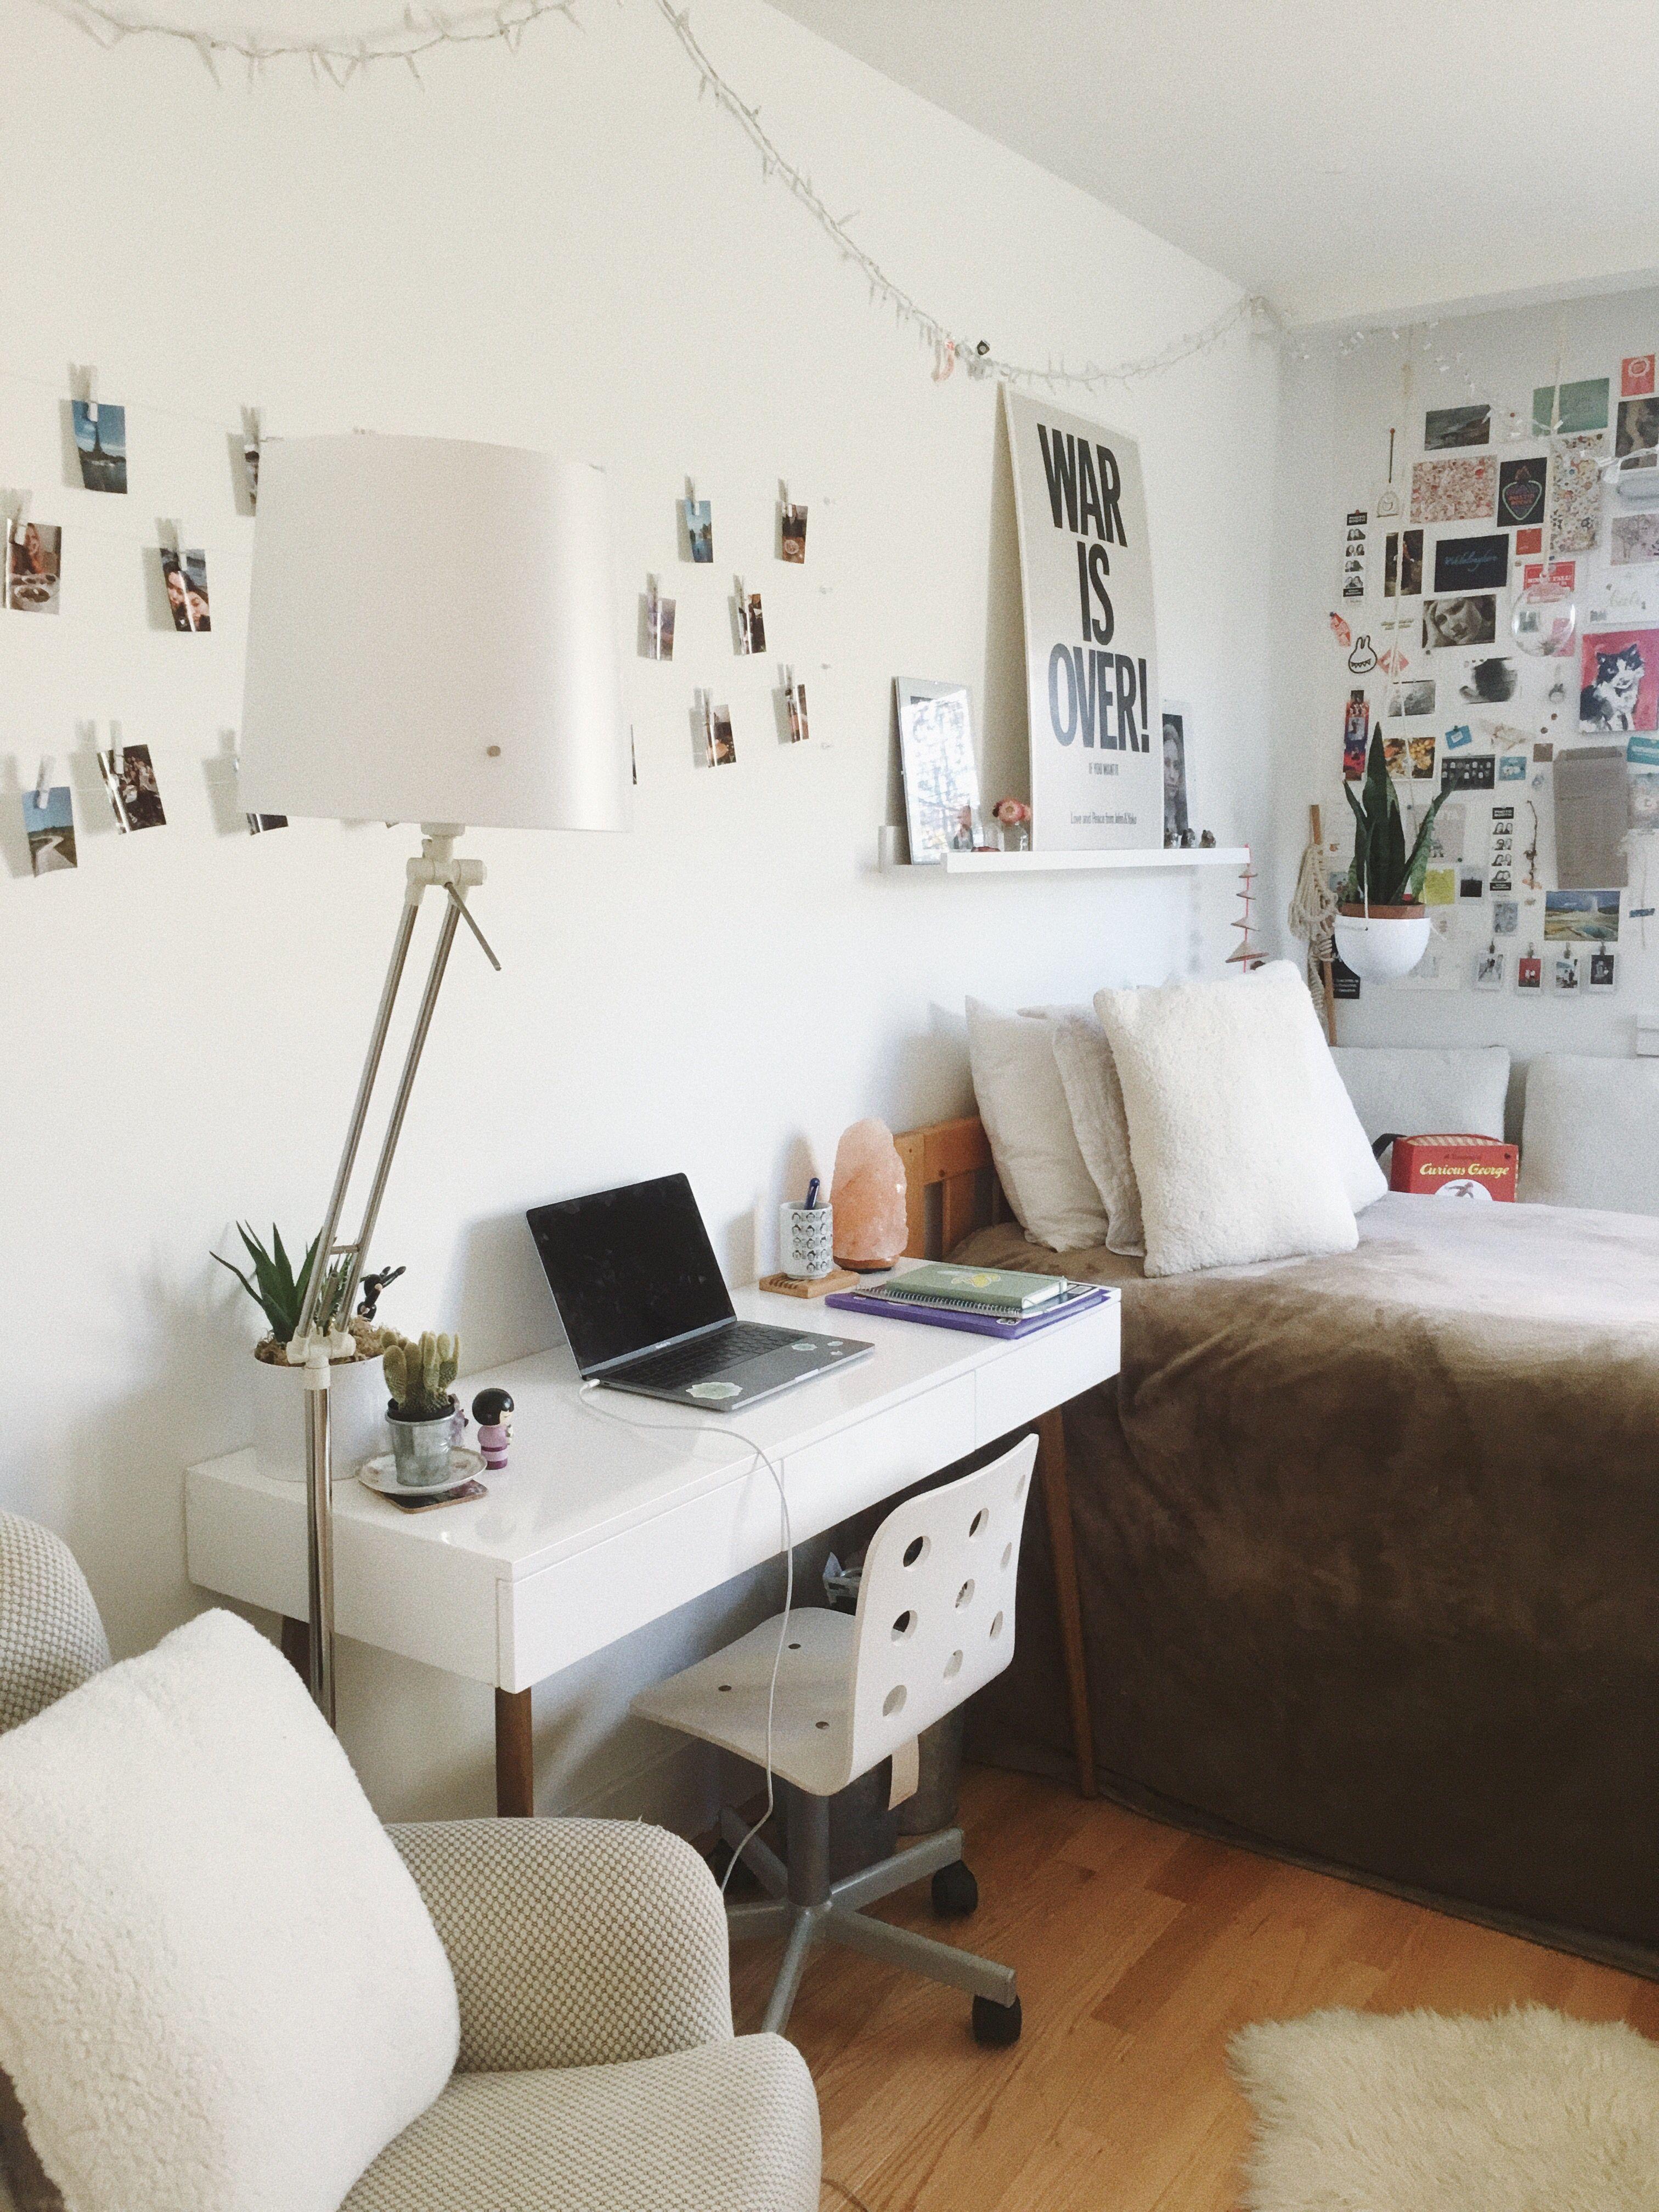 My Bedroom 2018 Aesthetic Bedroom Dining Room Centerpiece Room Inspo